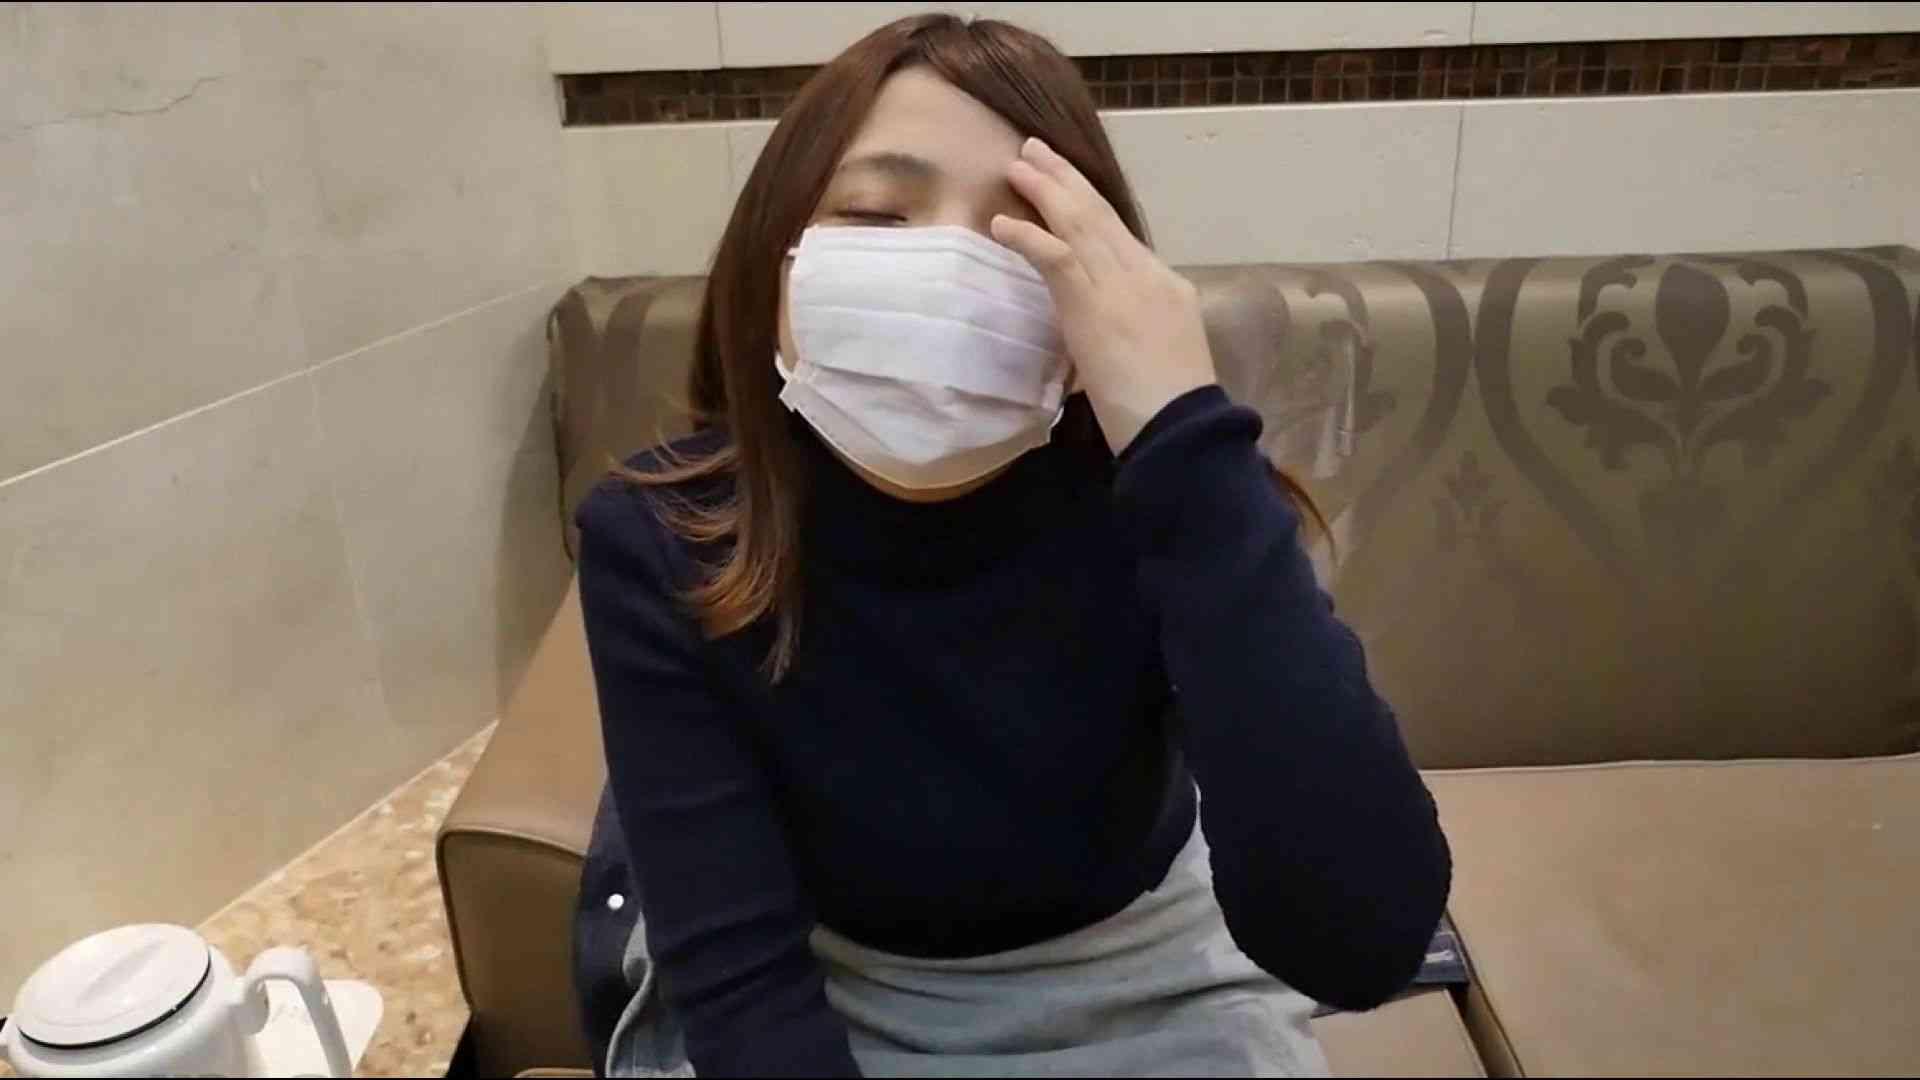 S級厳選美女ビッチガールVol.41 前編 OL女体   美女  105連発 37